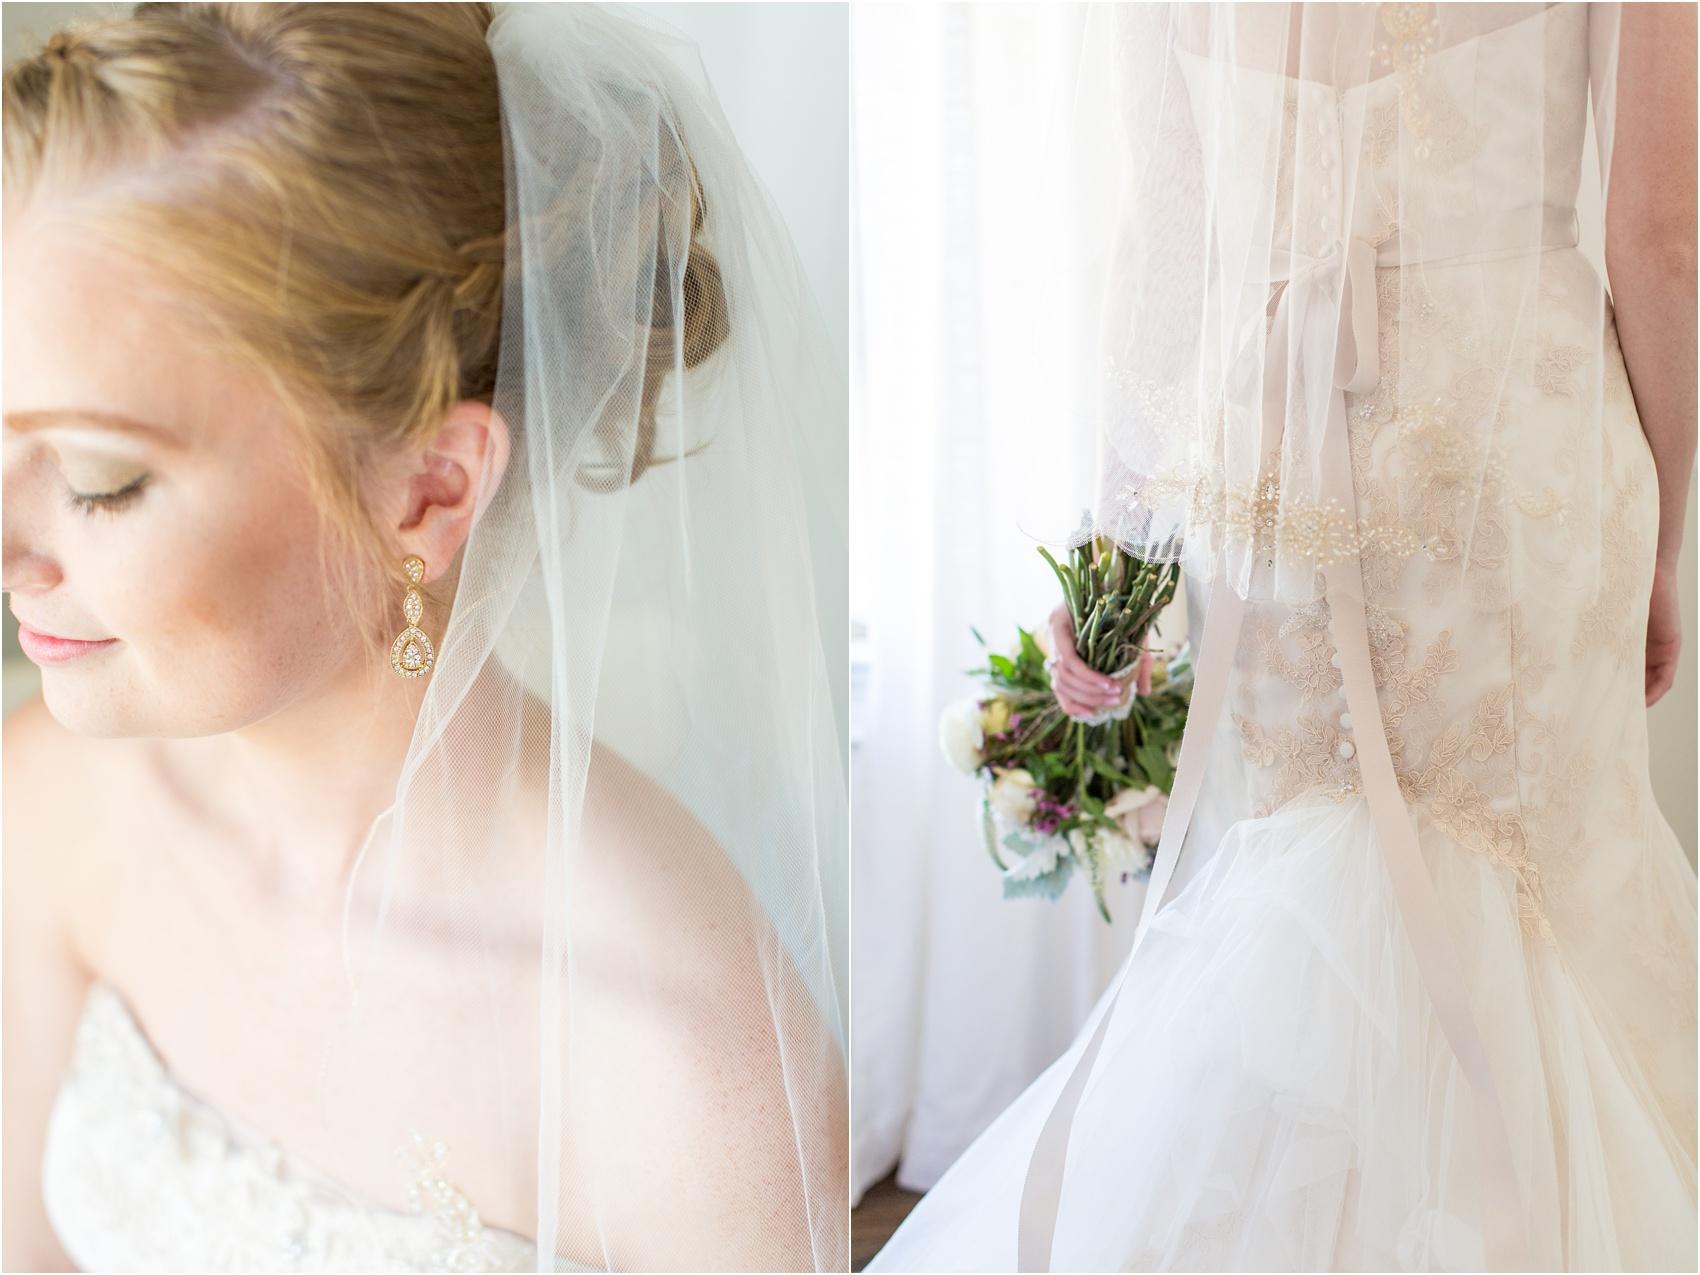 Savannah Eve Photography- Perkins Wedding- Blog-10.jpg